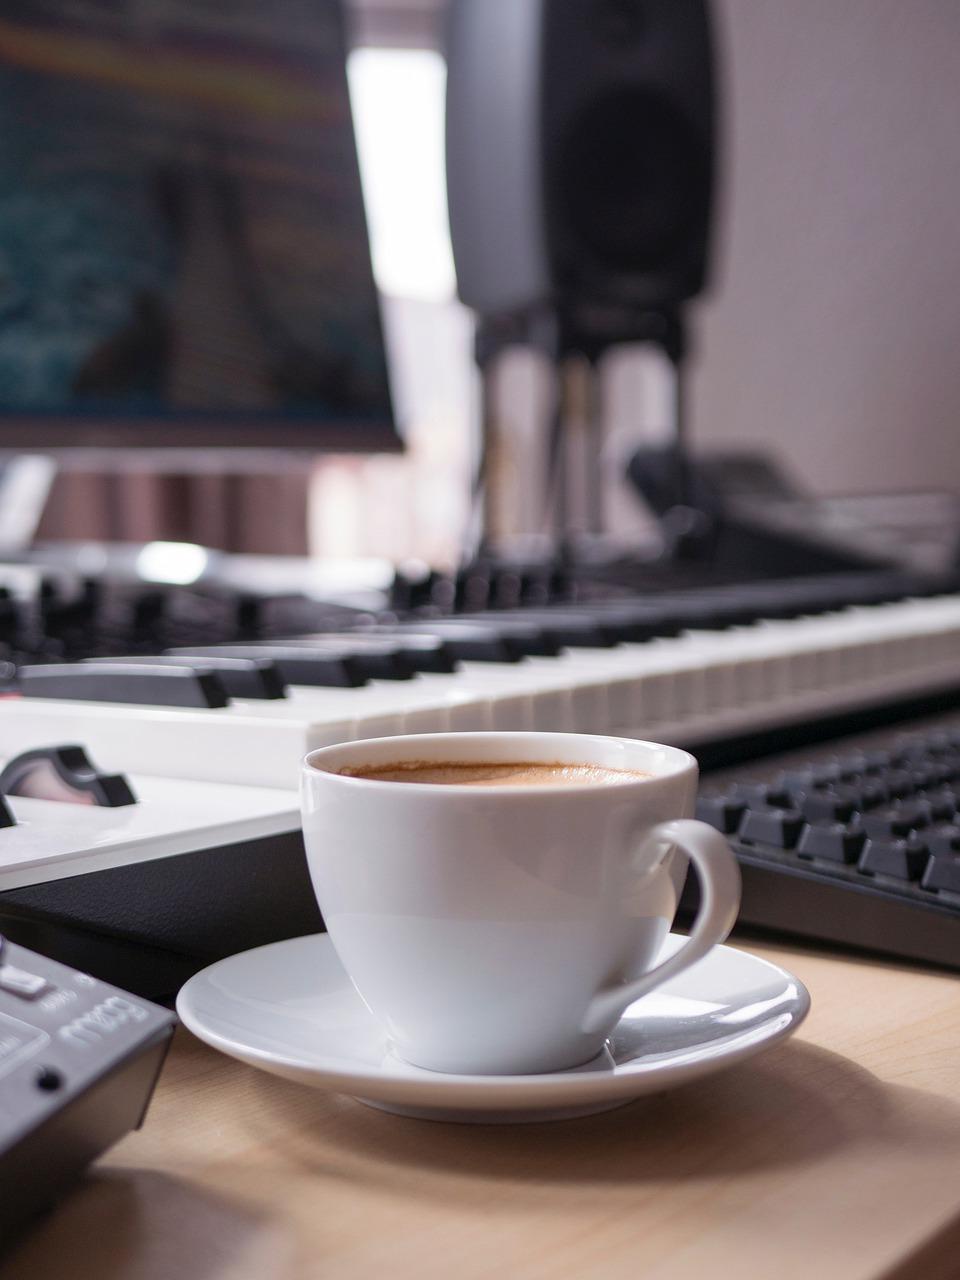 Coffee Cup Desk Equipment Music  - groovelanddesigns / Pixabay